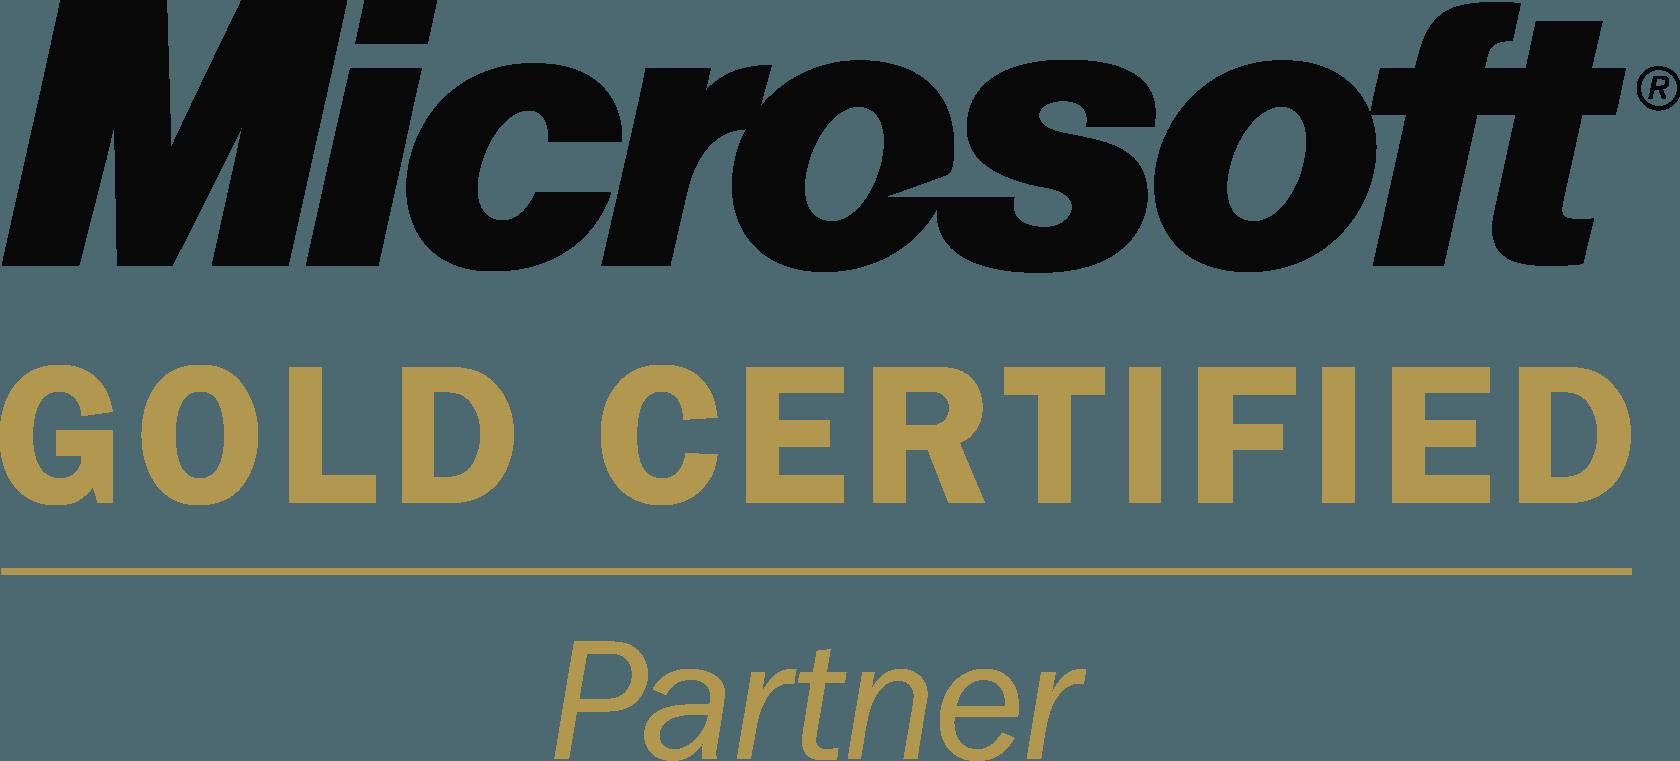 Microsoft Gold Certified Partner Logo png